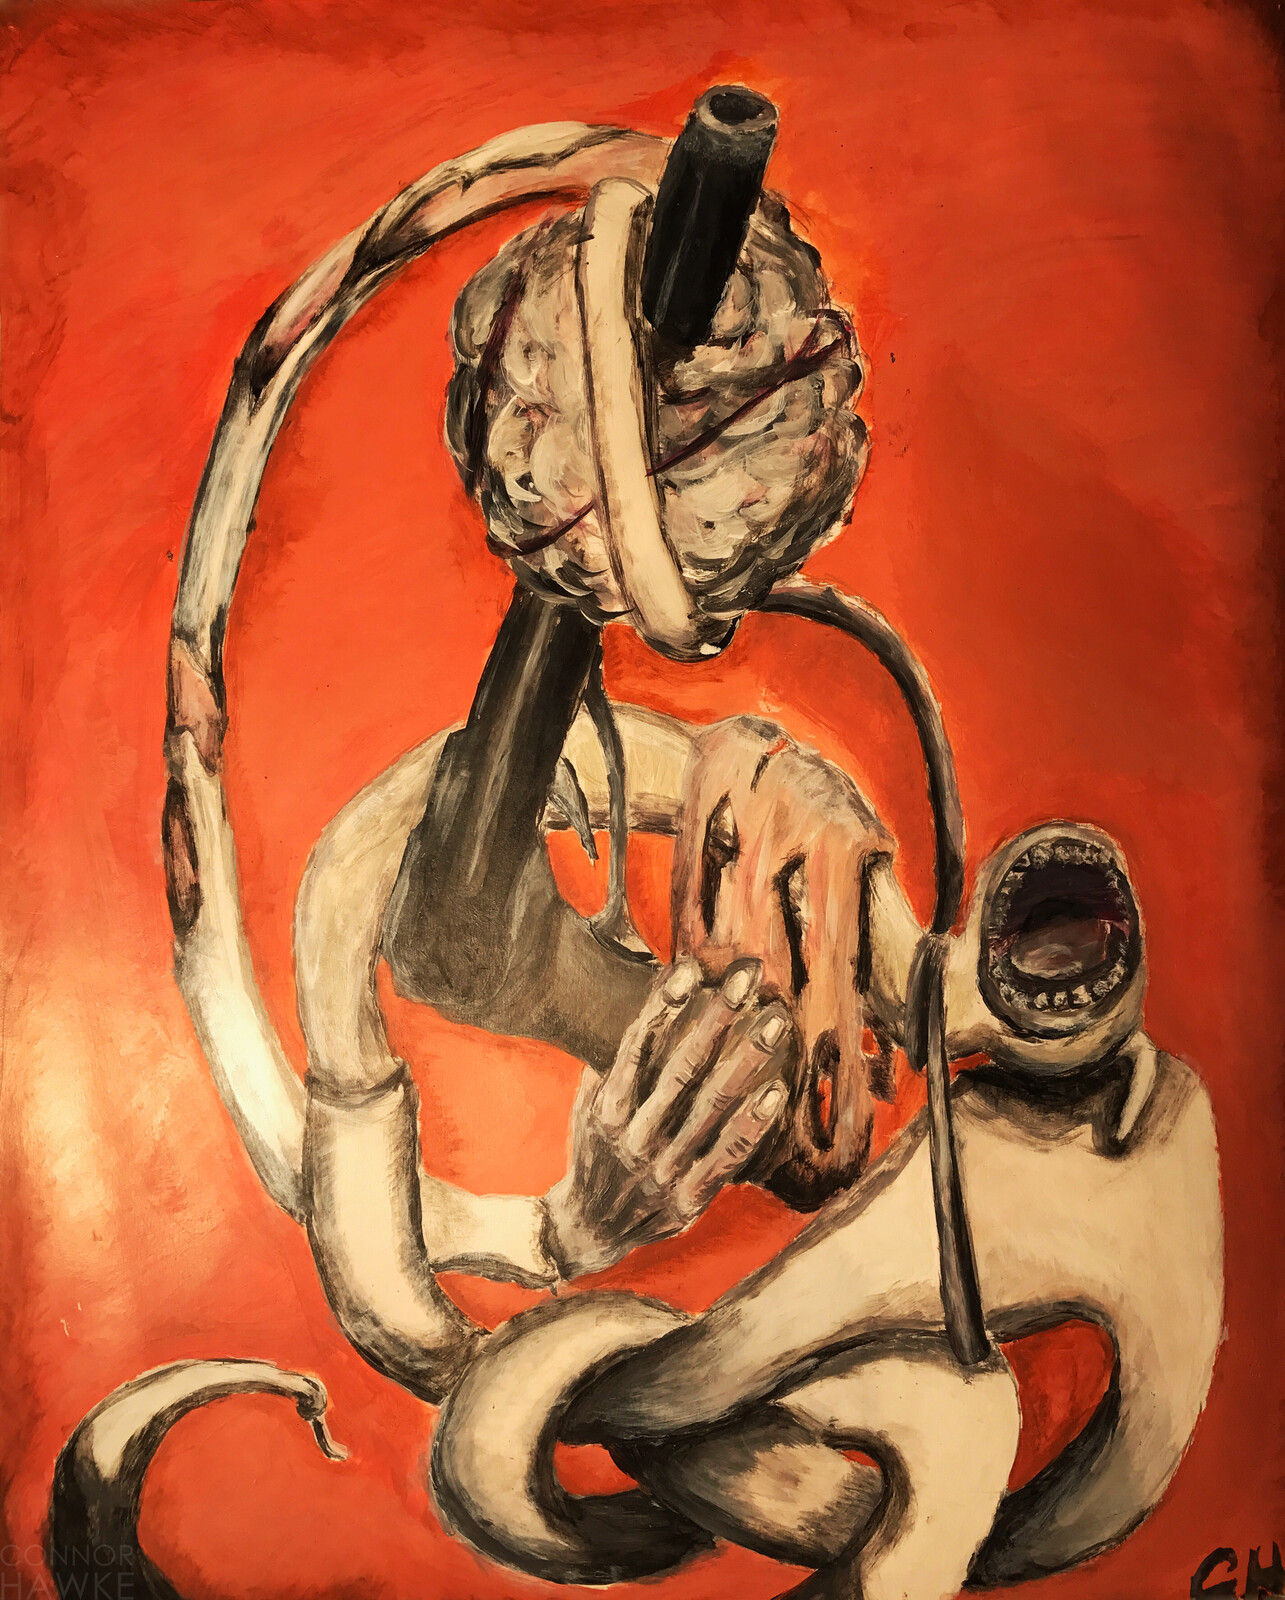 """Rage"" by Connor Hawke"